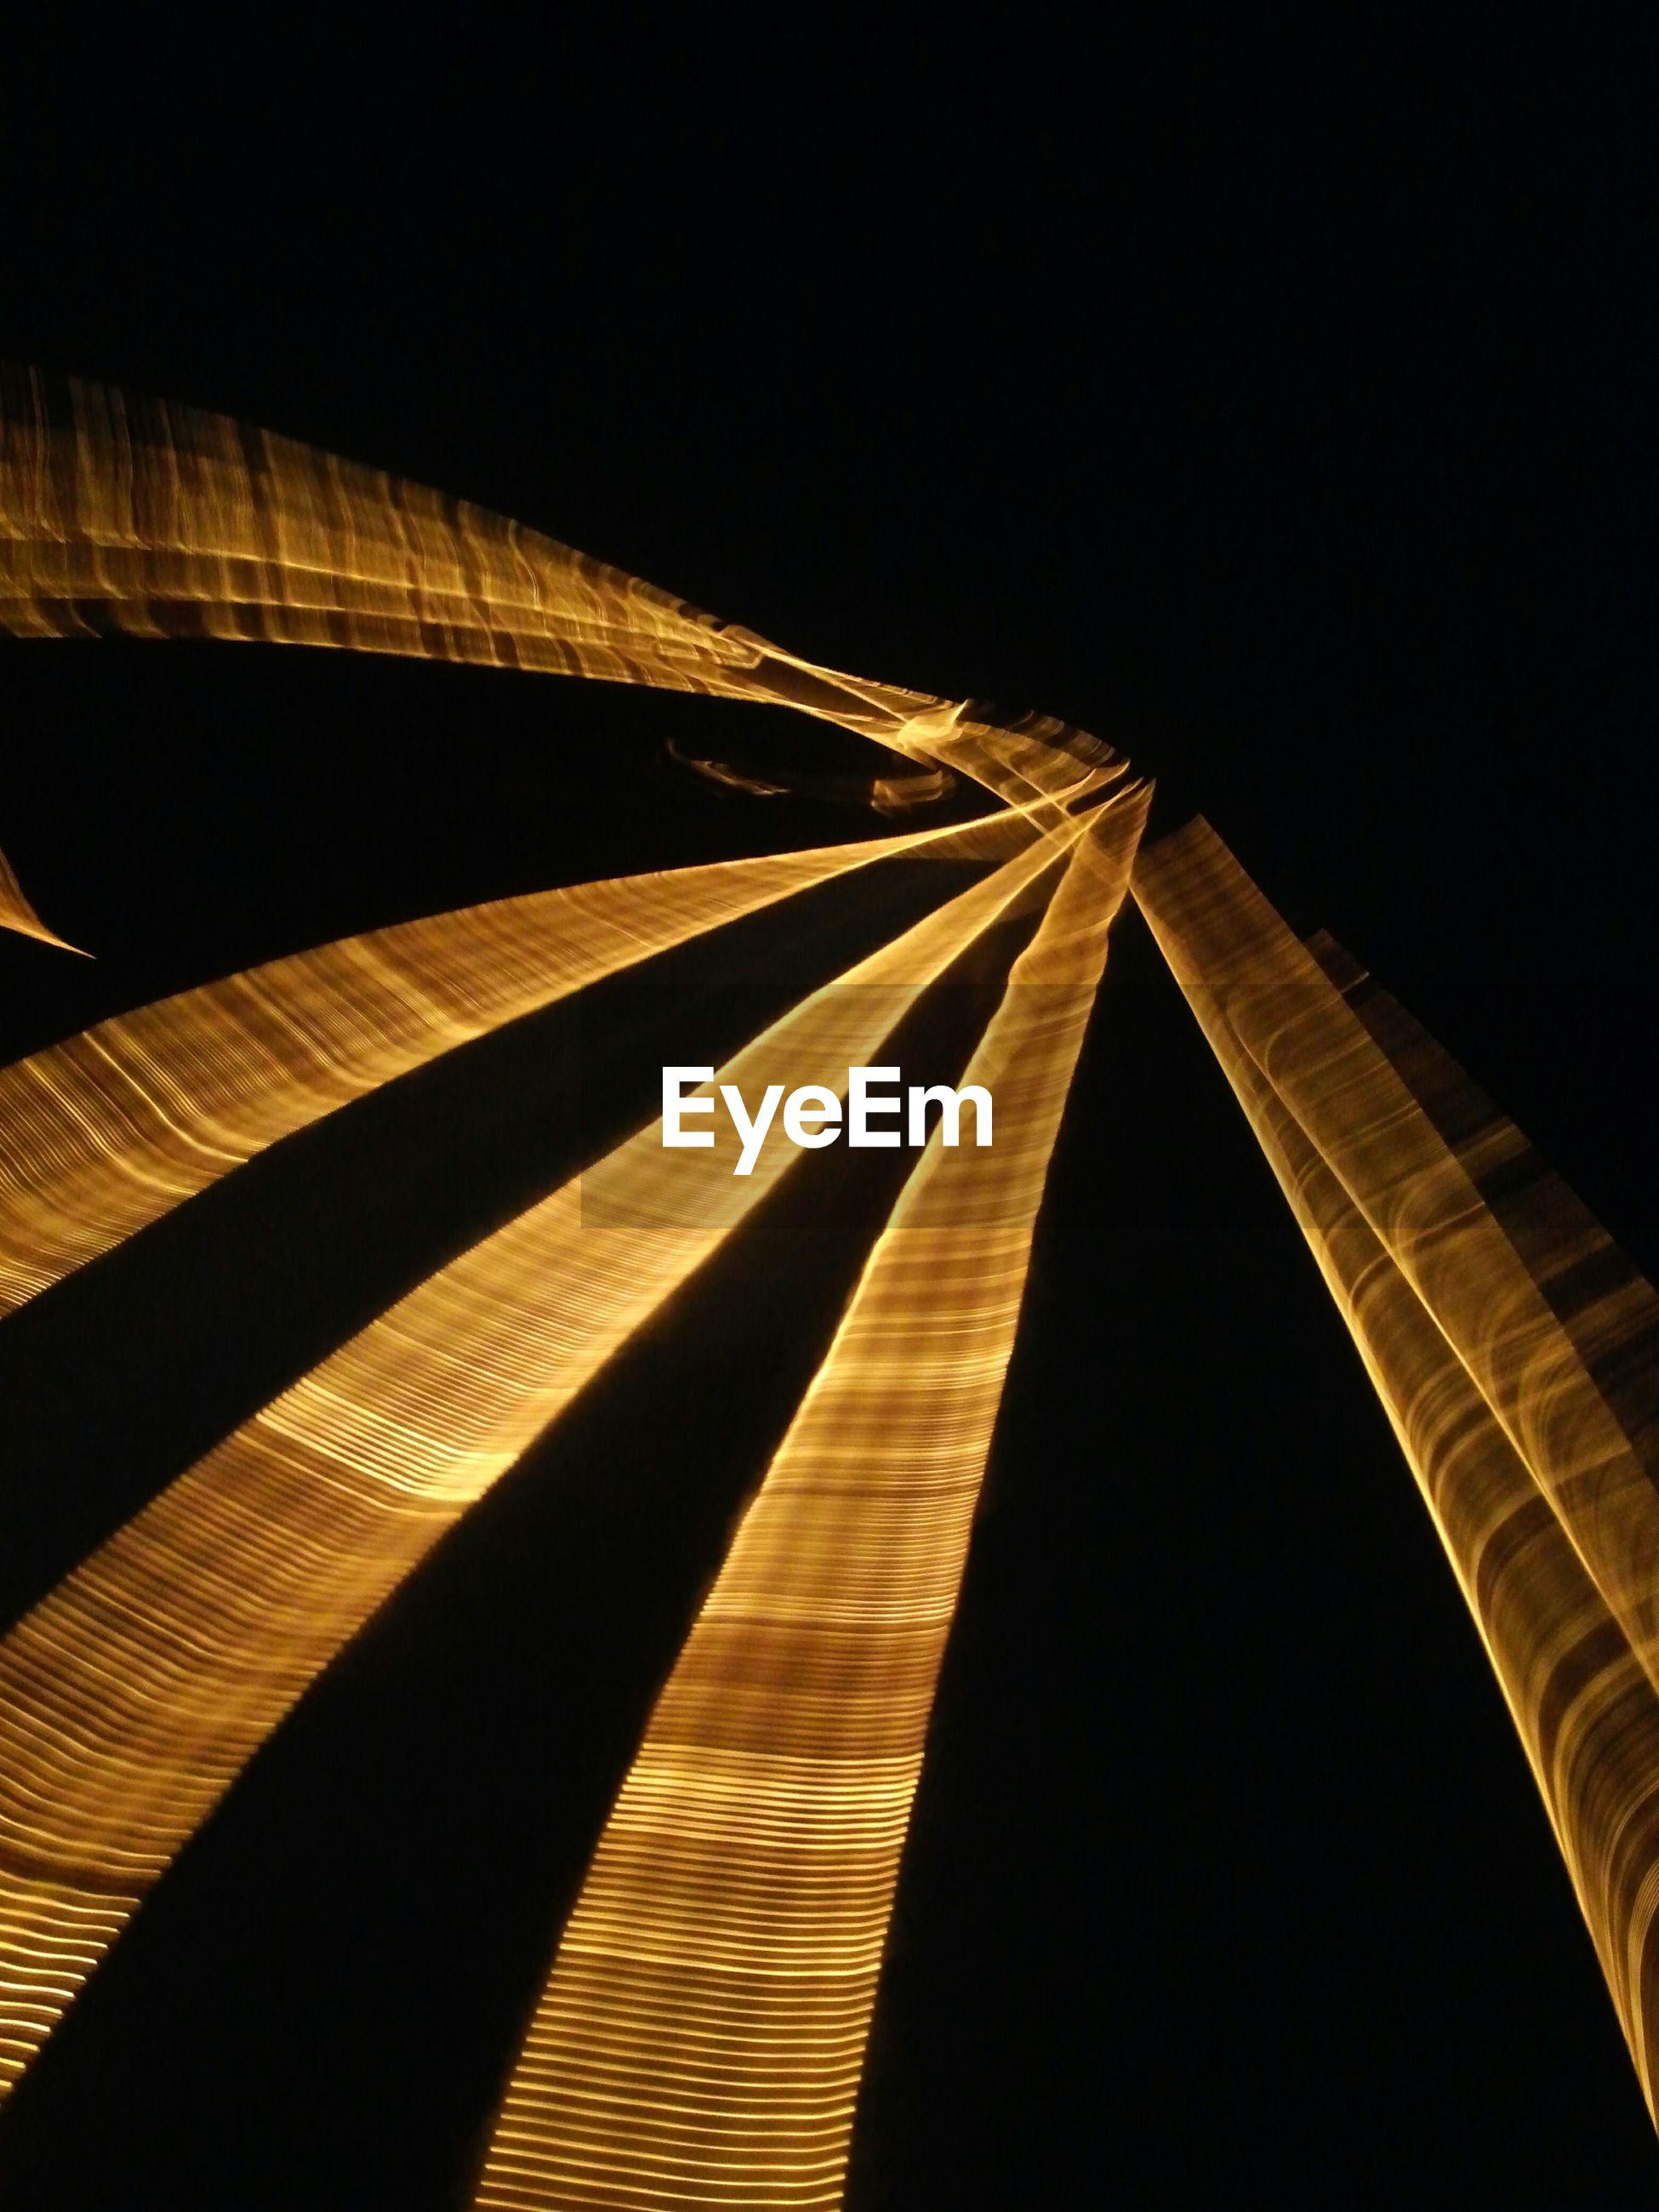 Blurred motion of illuminated pyramid at night